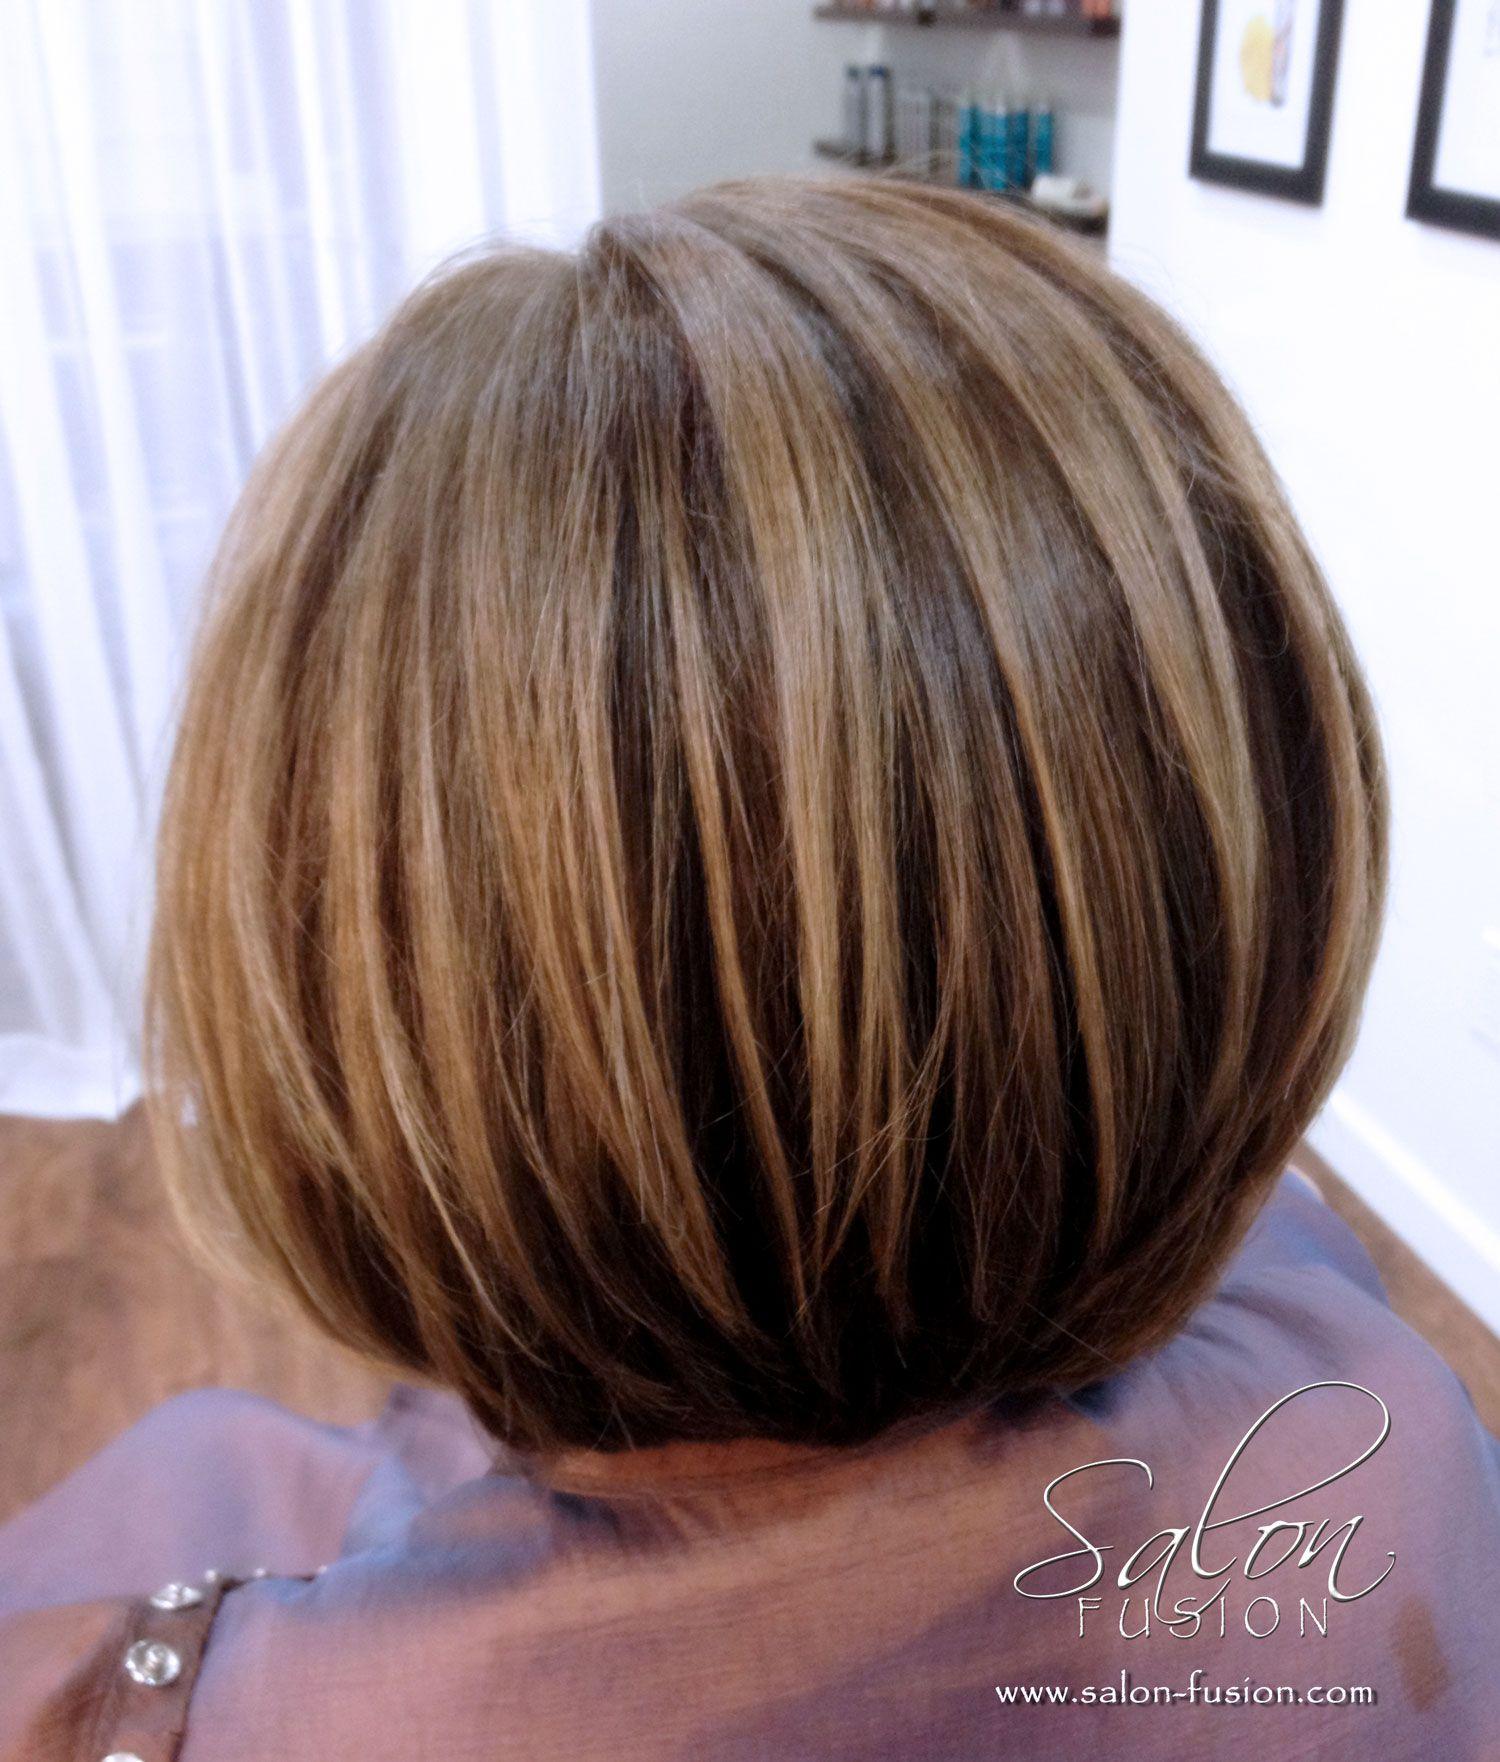 Pin On Hair Salon Fusion